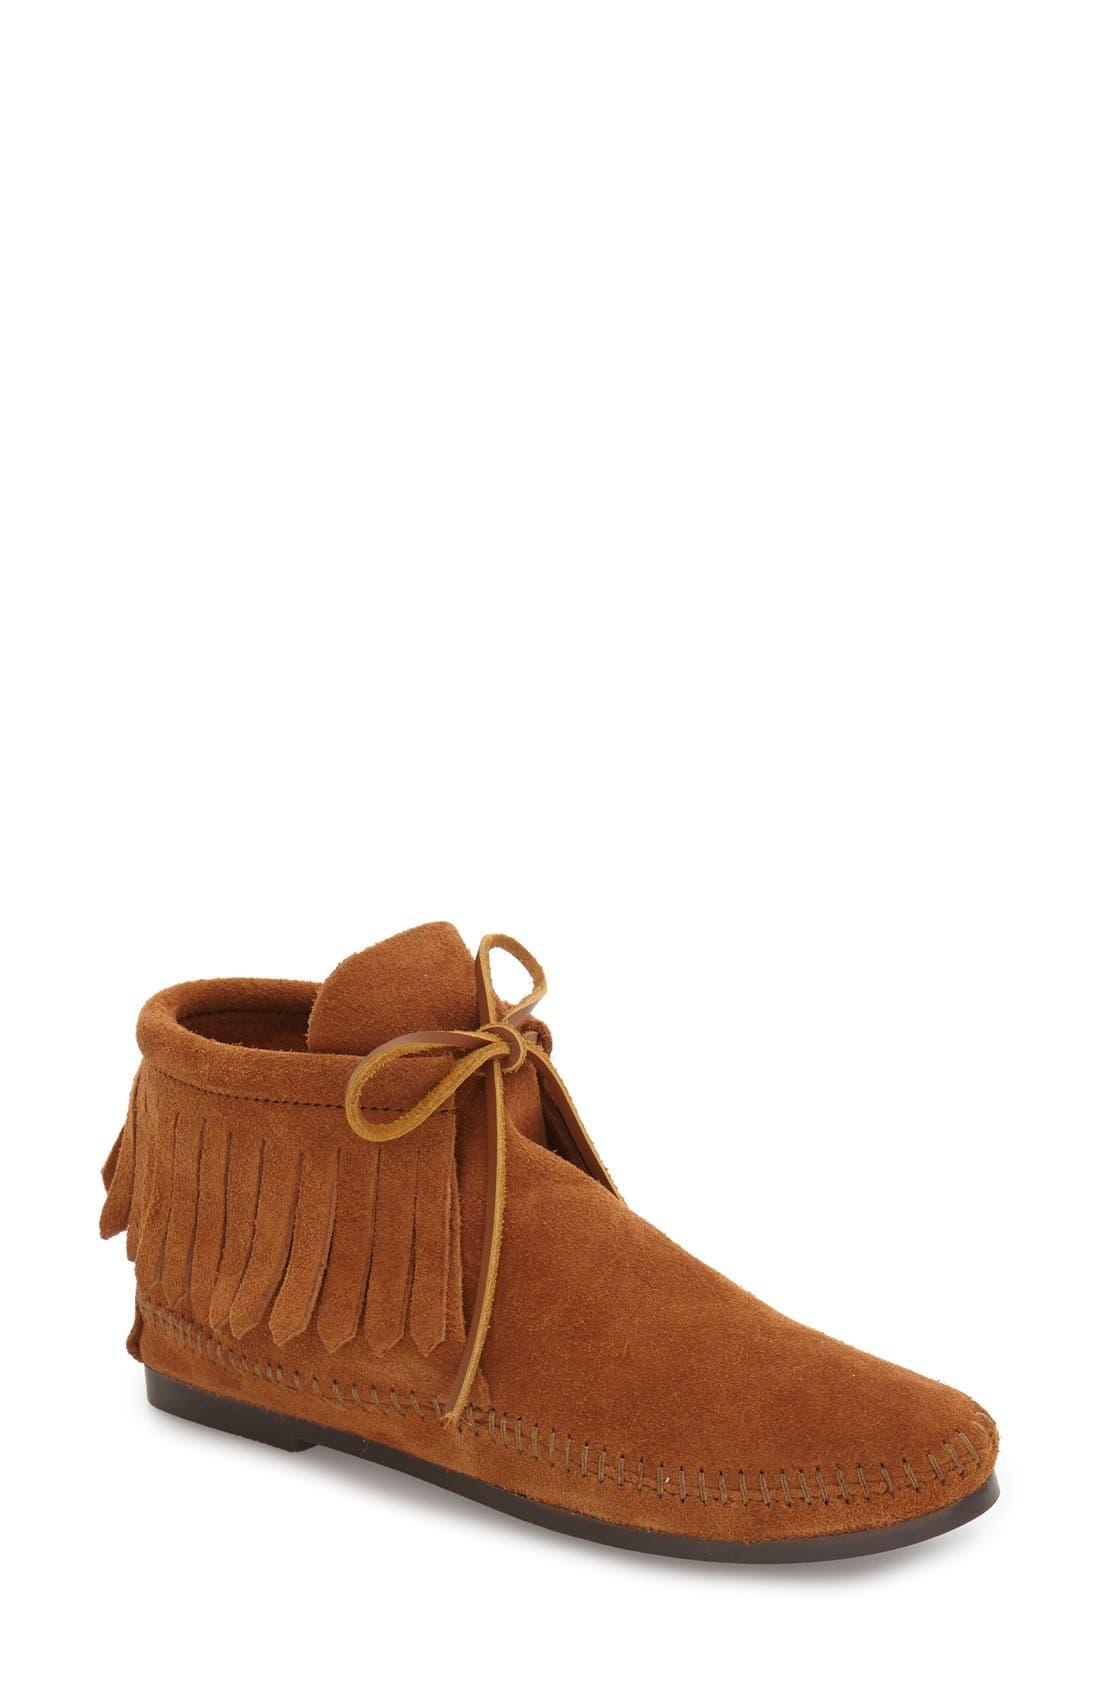 MINNETONKA, Classic Fringed Chukka Style Boot, Main thumbnail 1, color, BROWN